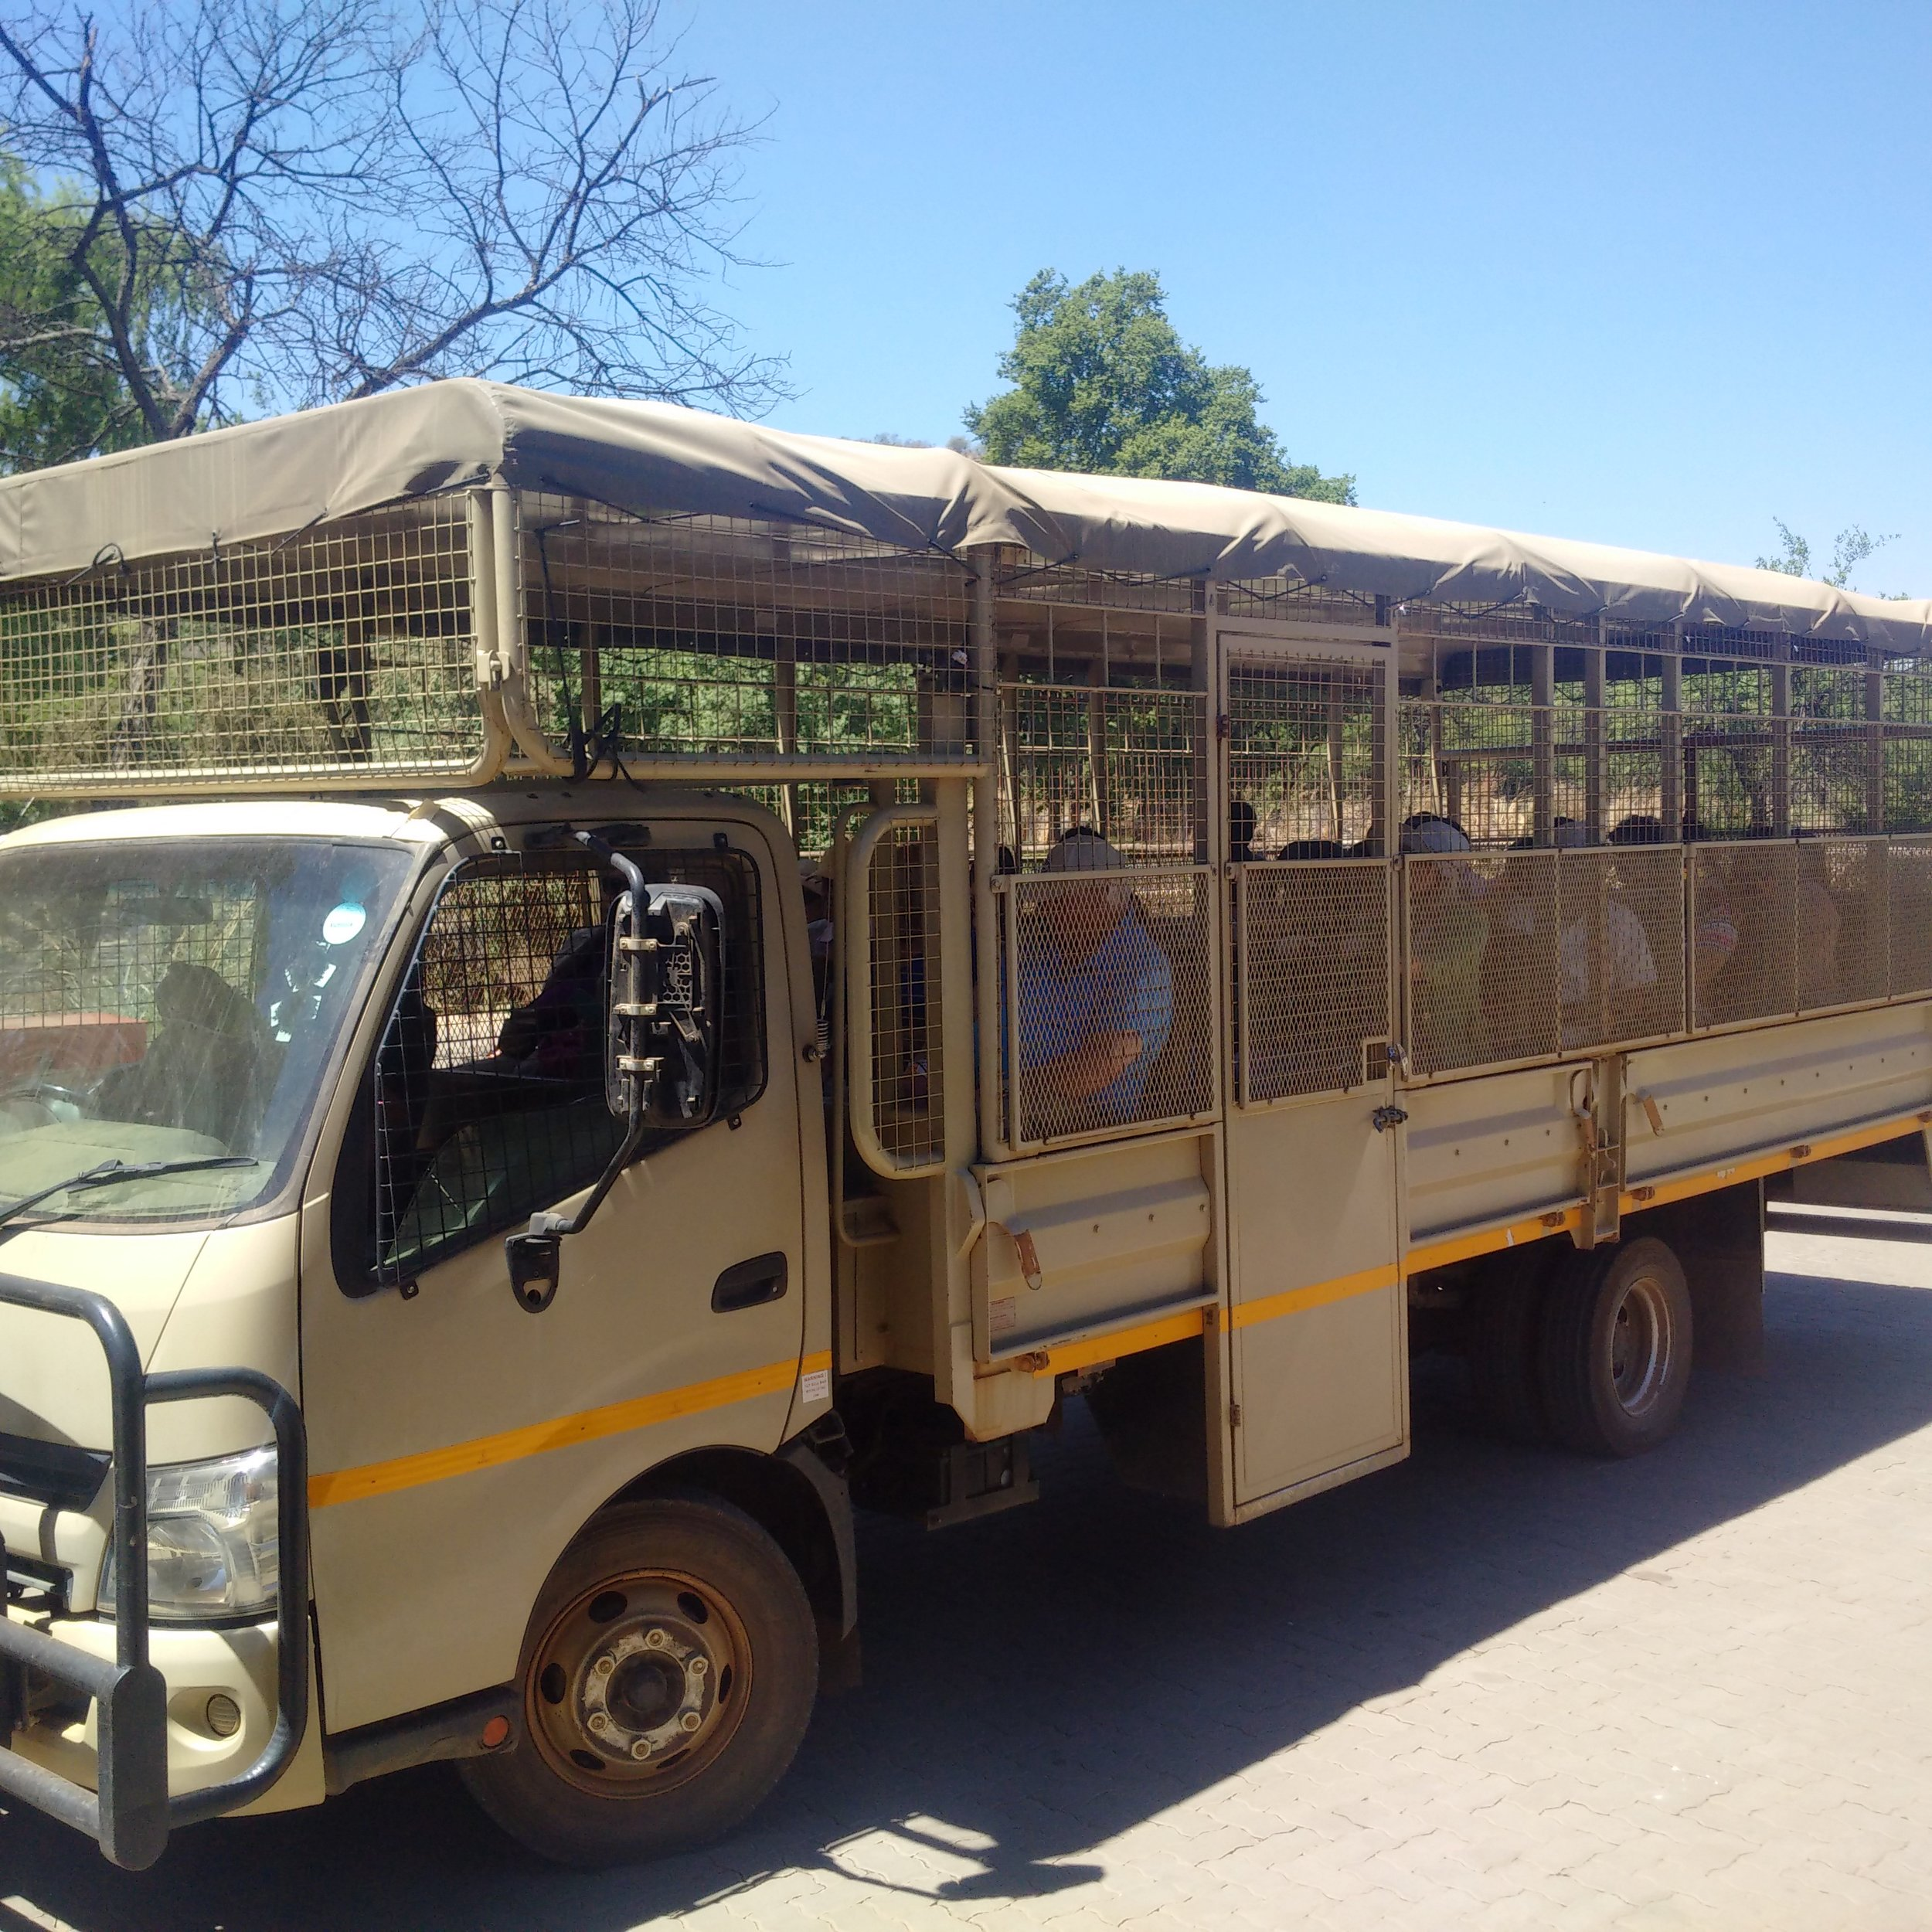 The Safari truck